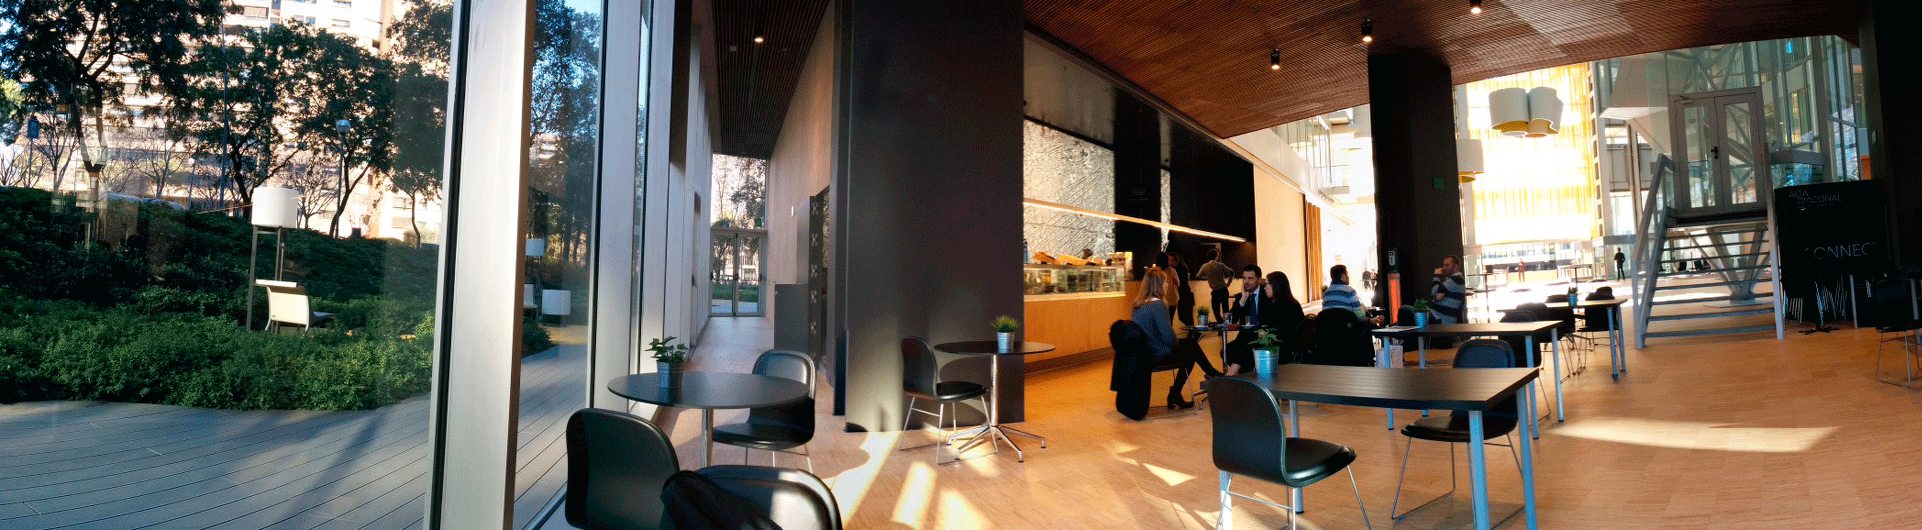 oficinas barcelona s4g